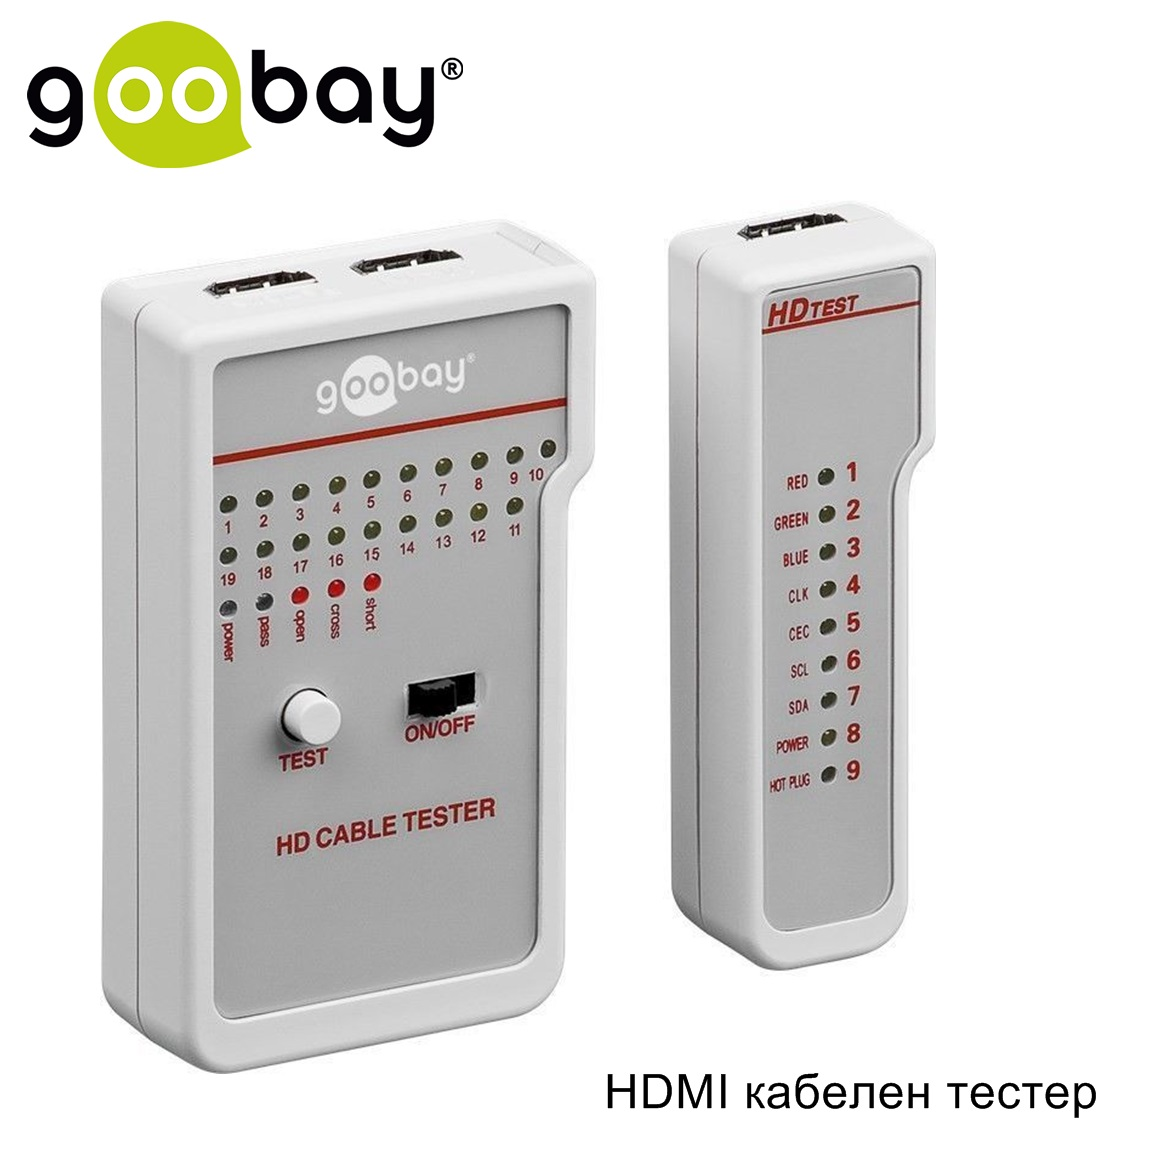 HDMI кабелен тестер GOOBAY 31961